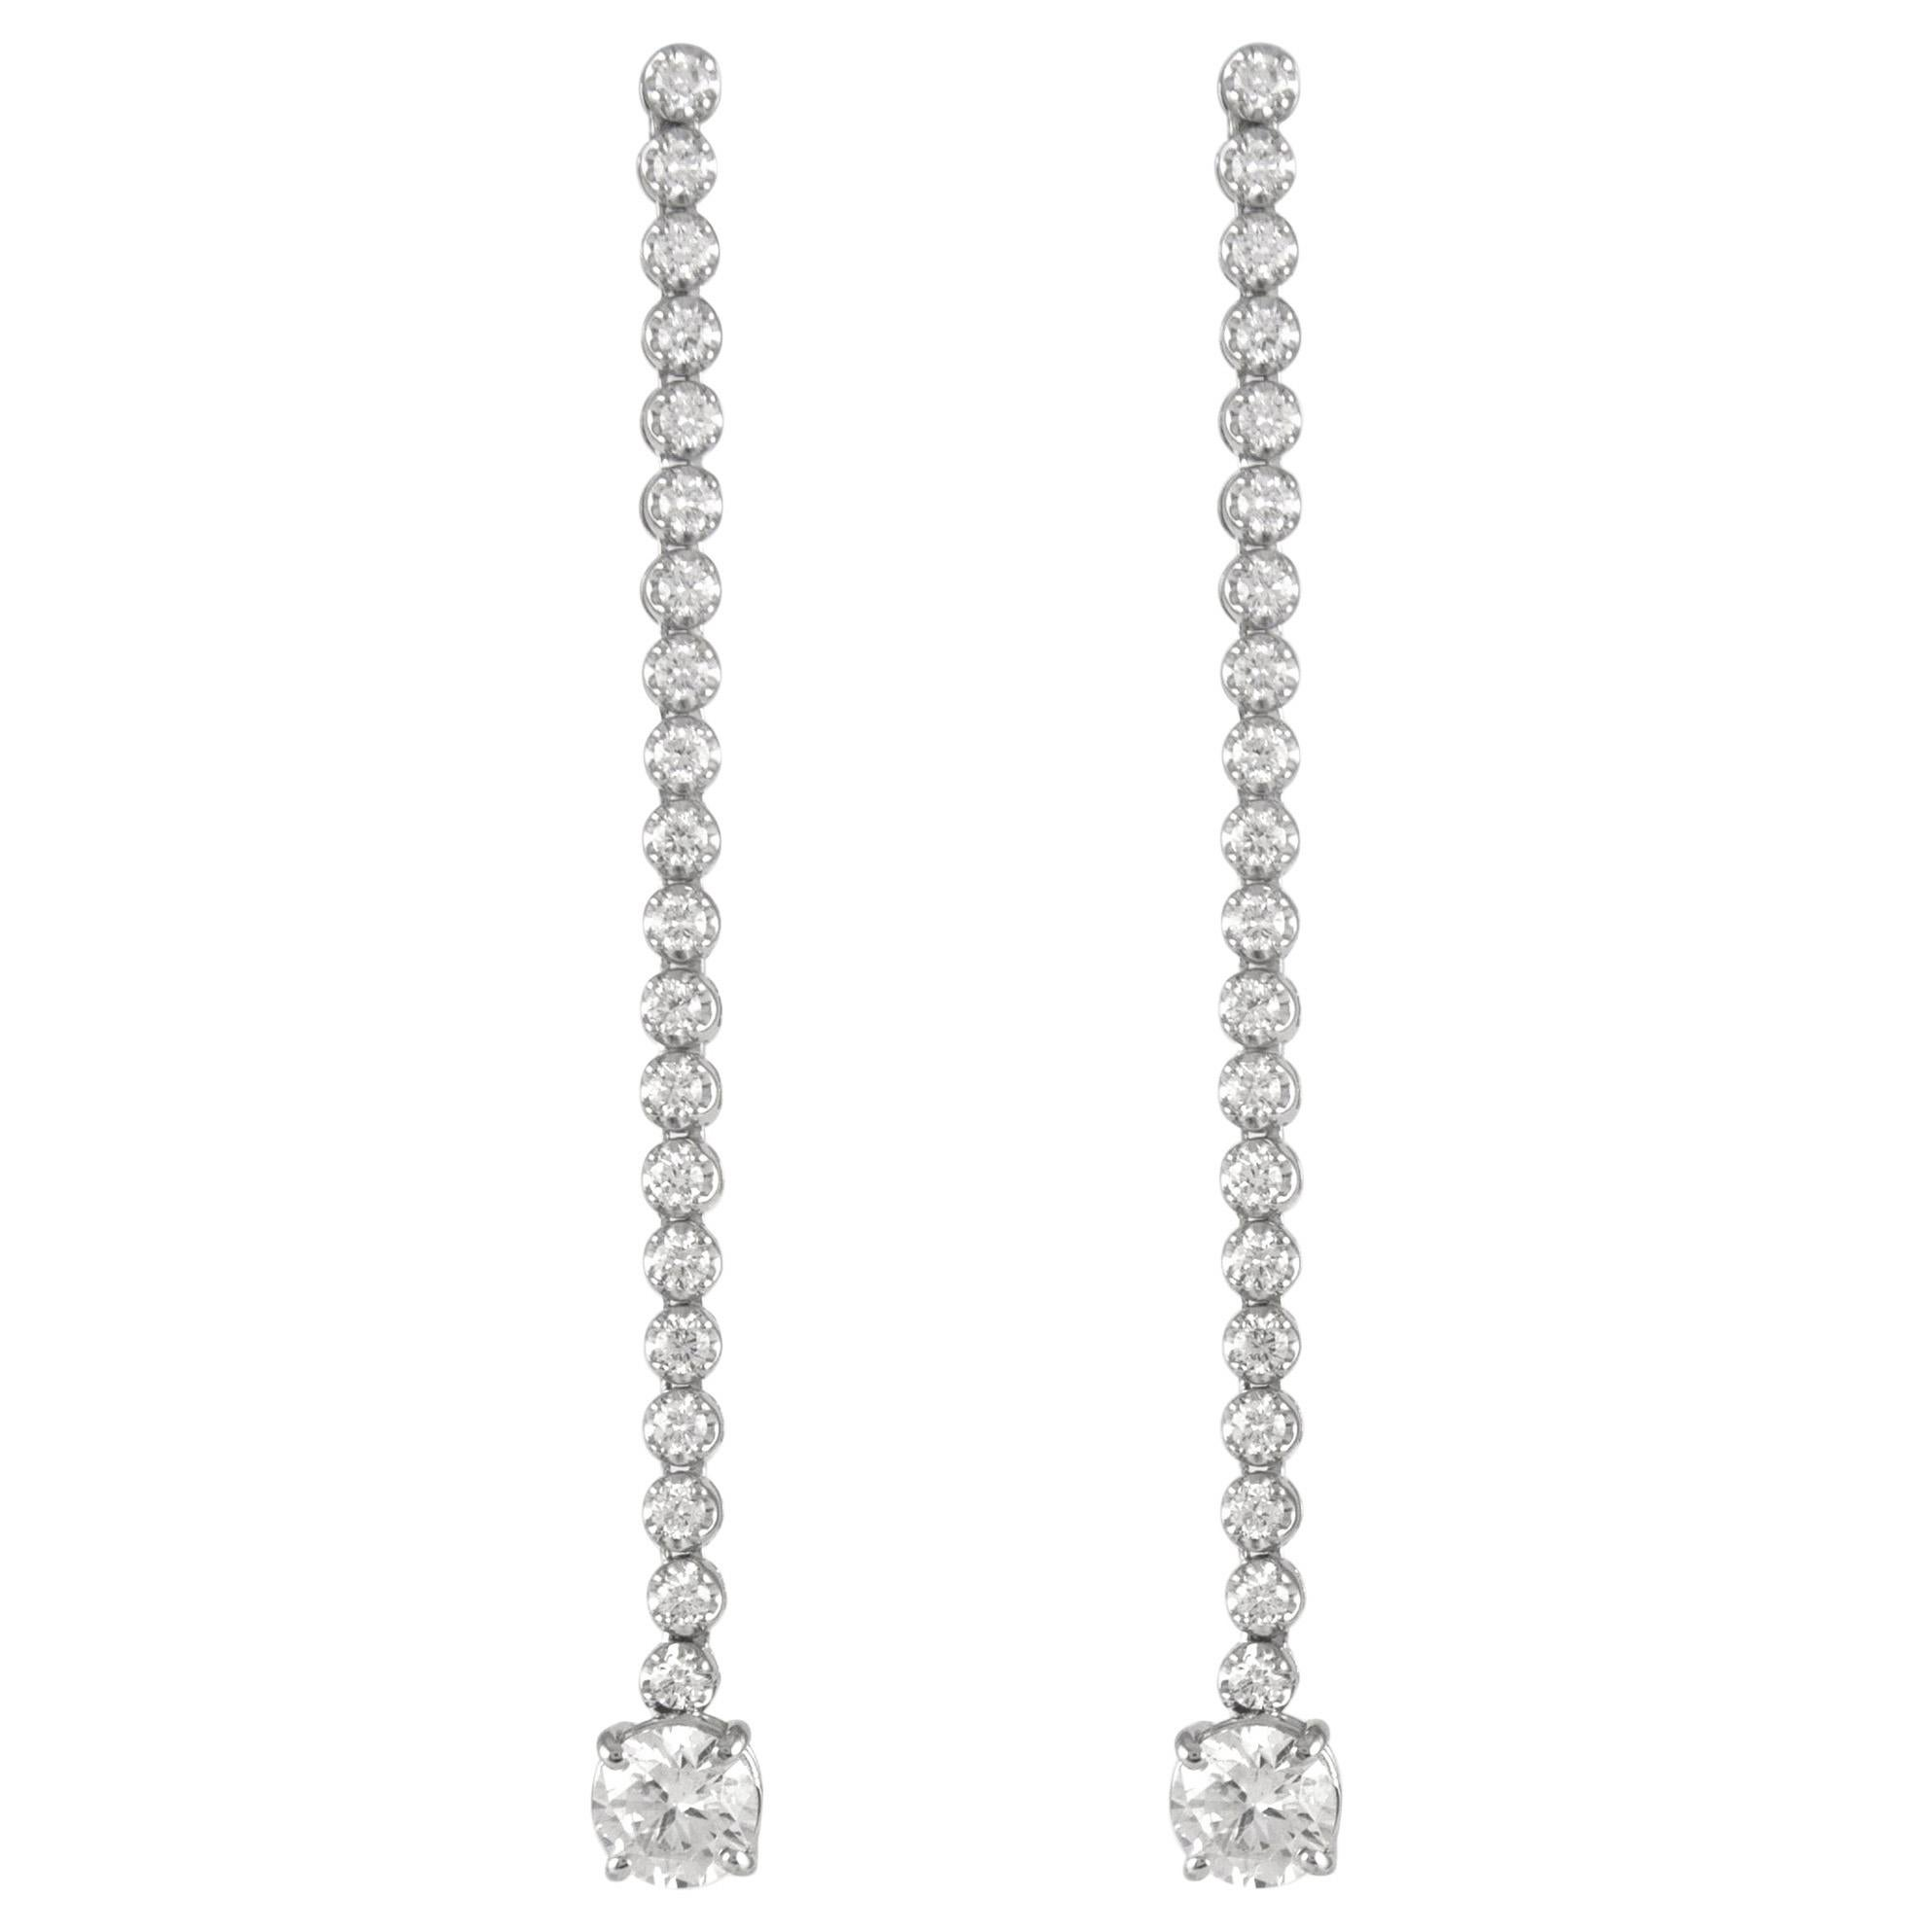 EGL Certified 3.70 Carat Drop Diamond Earrings 18 Karat White Gold